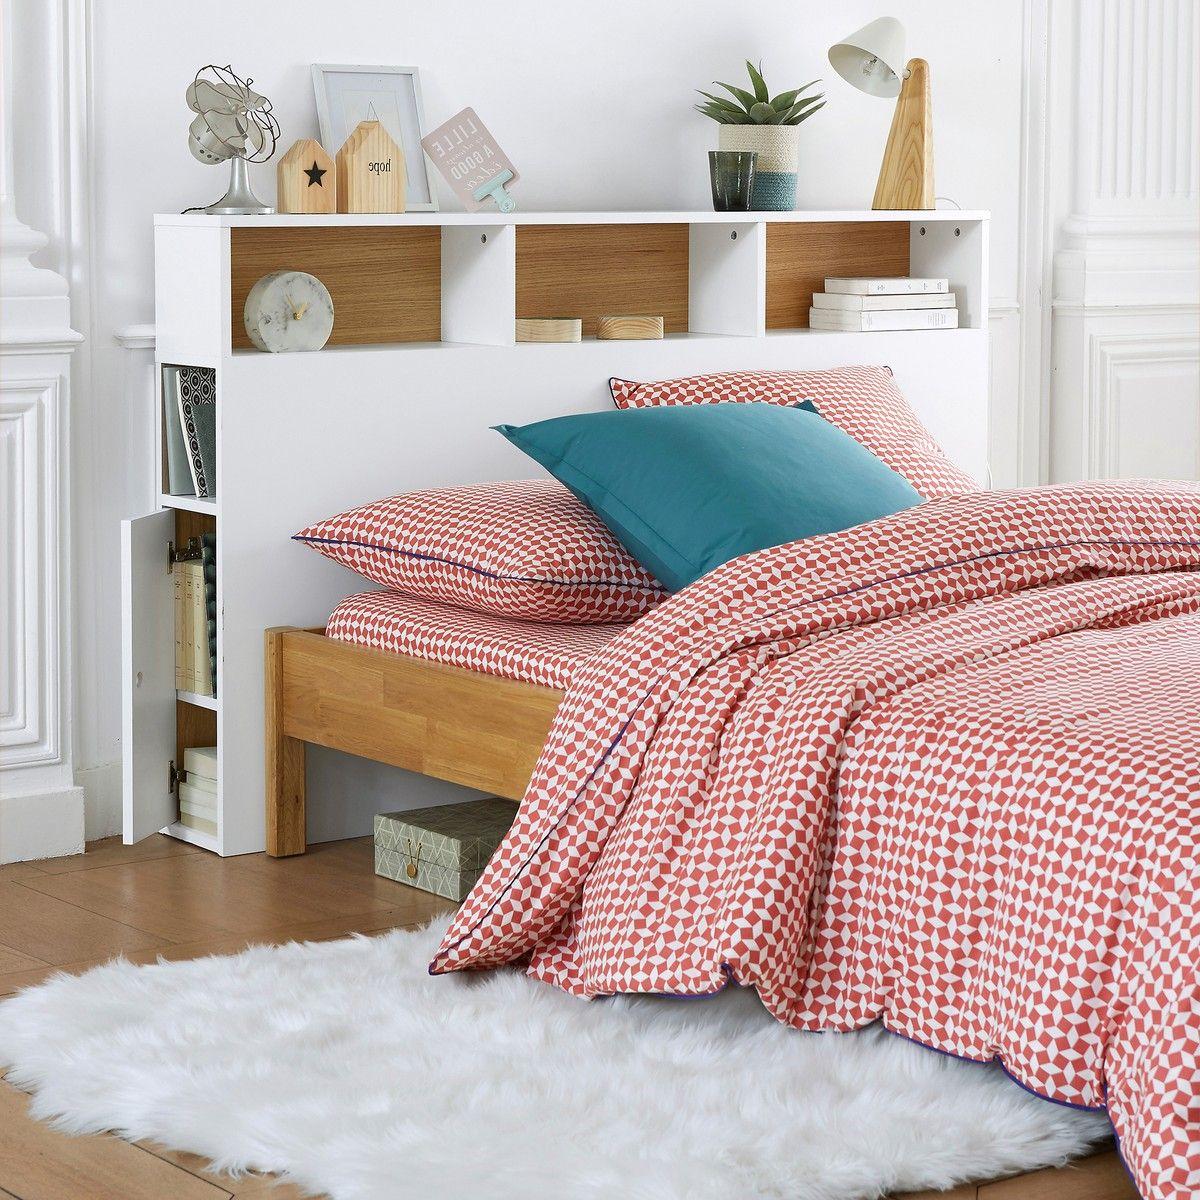 Cabecero de cama con organización